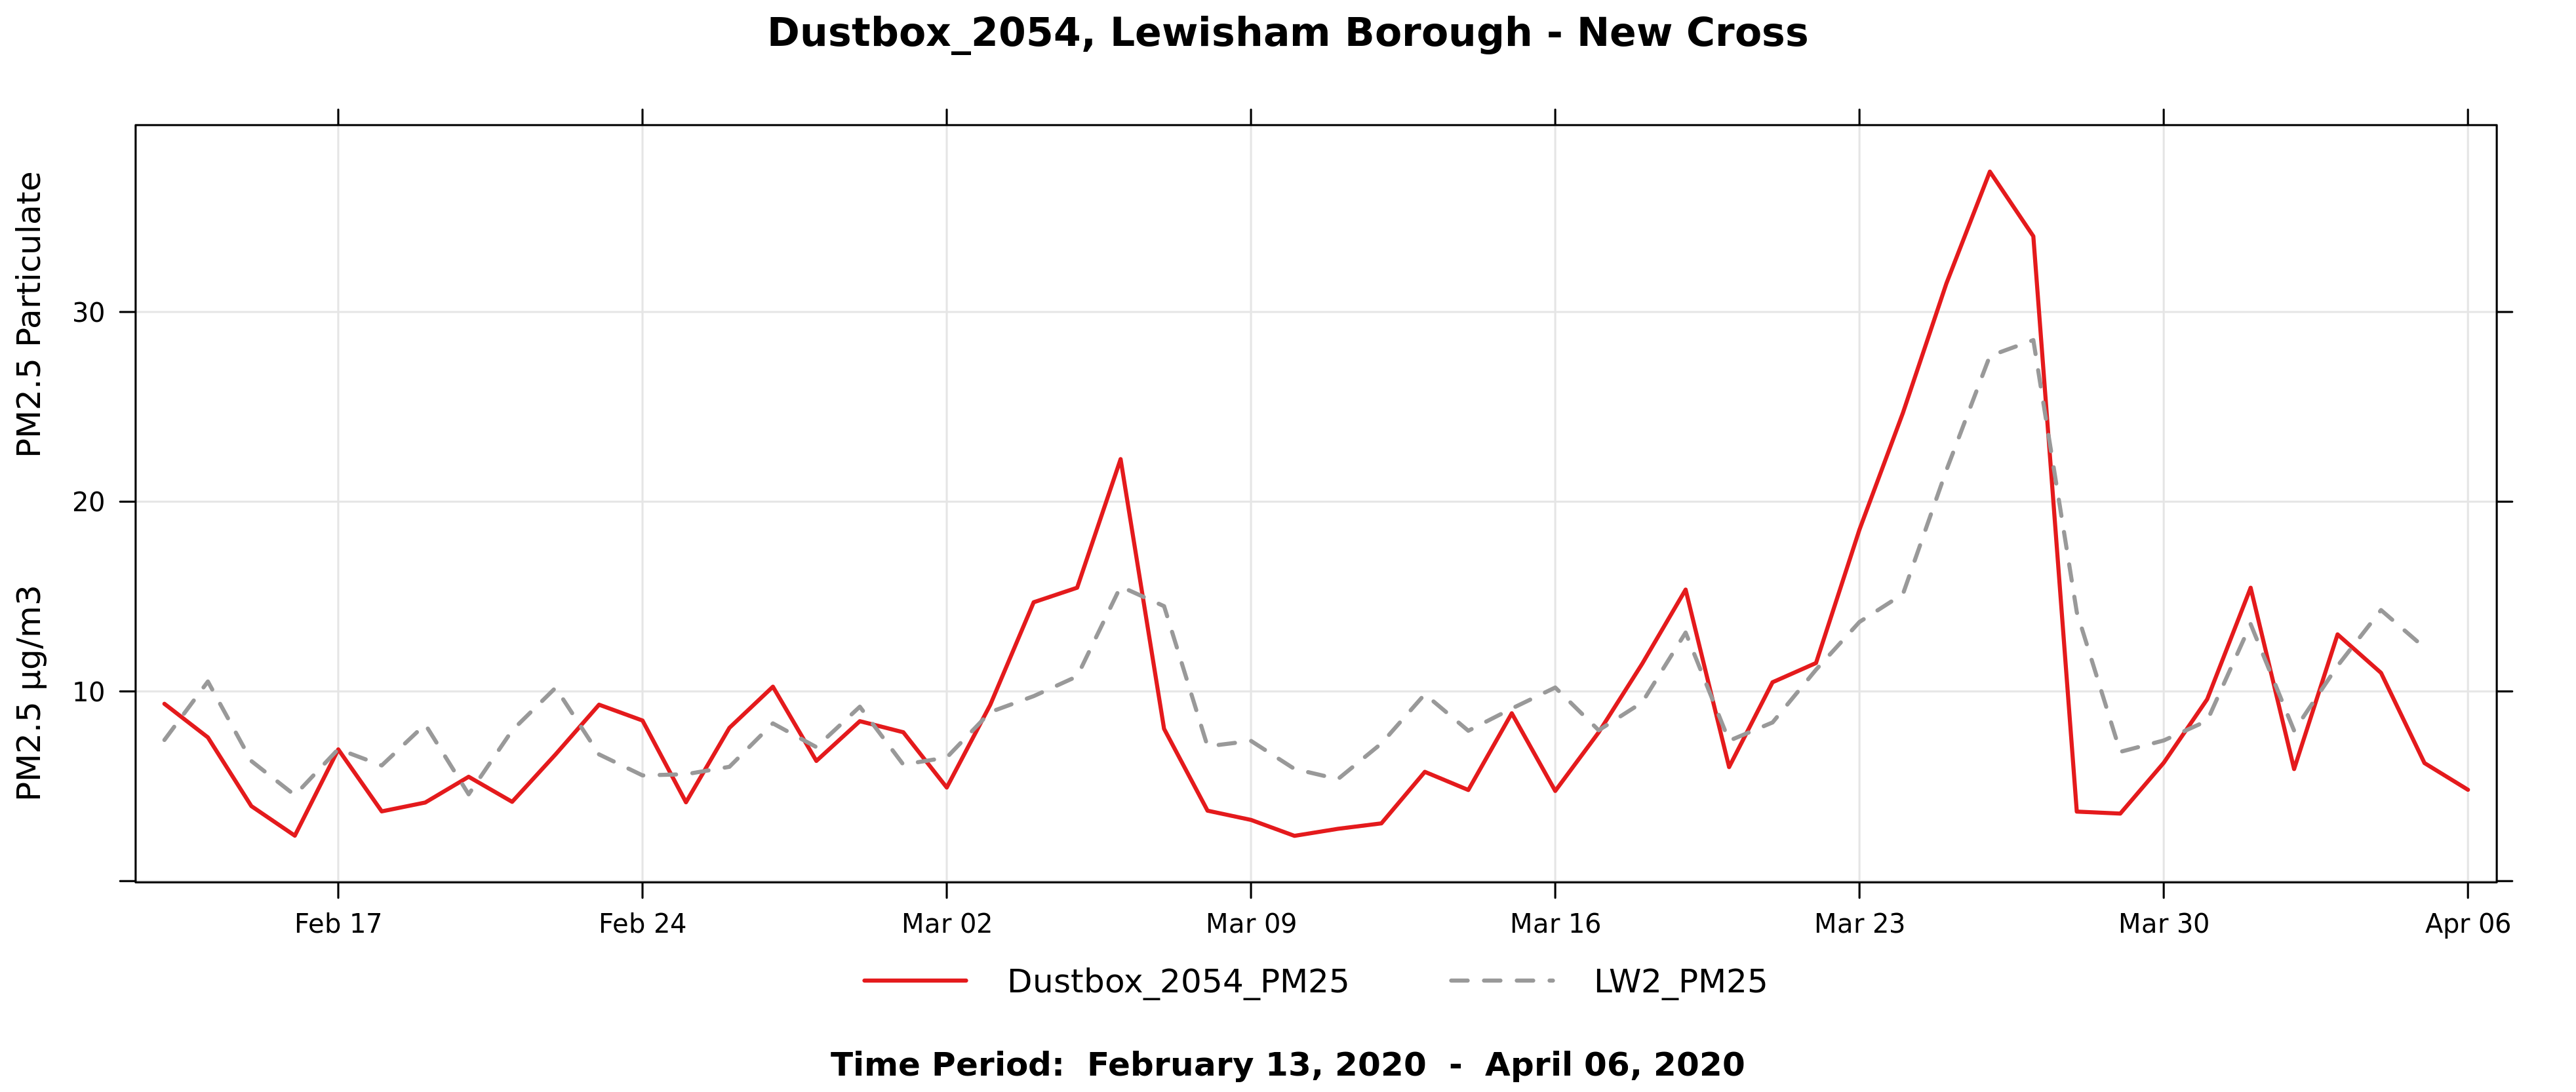 Figure10_Dustbox_2054_NXG_LinePlot